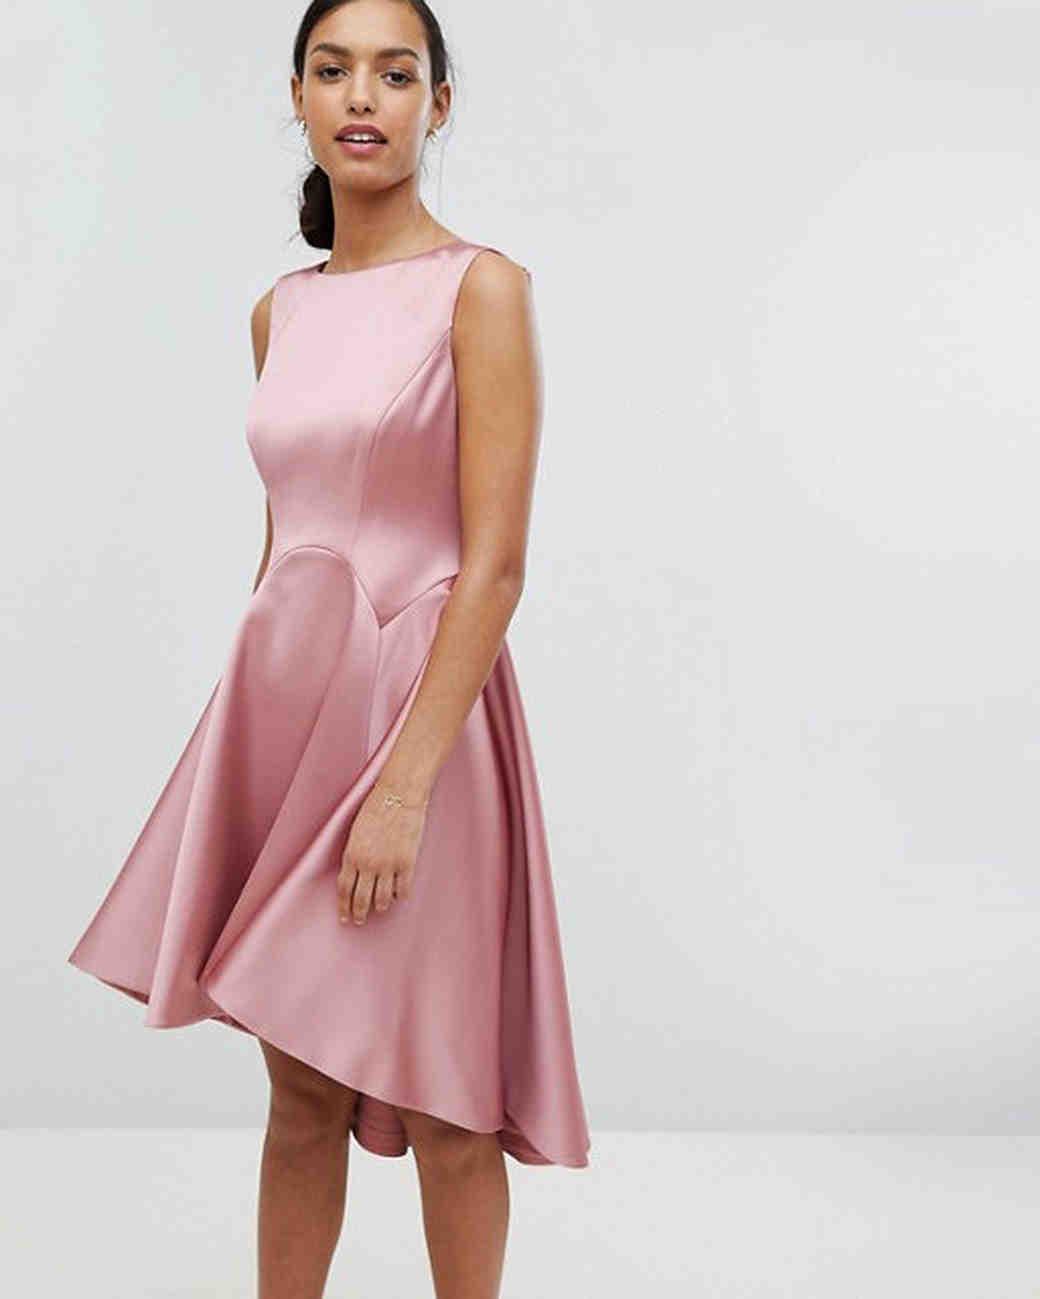 In Silk Dresses